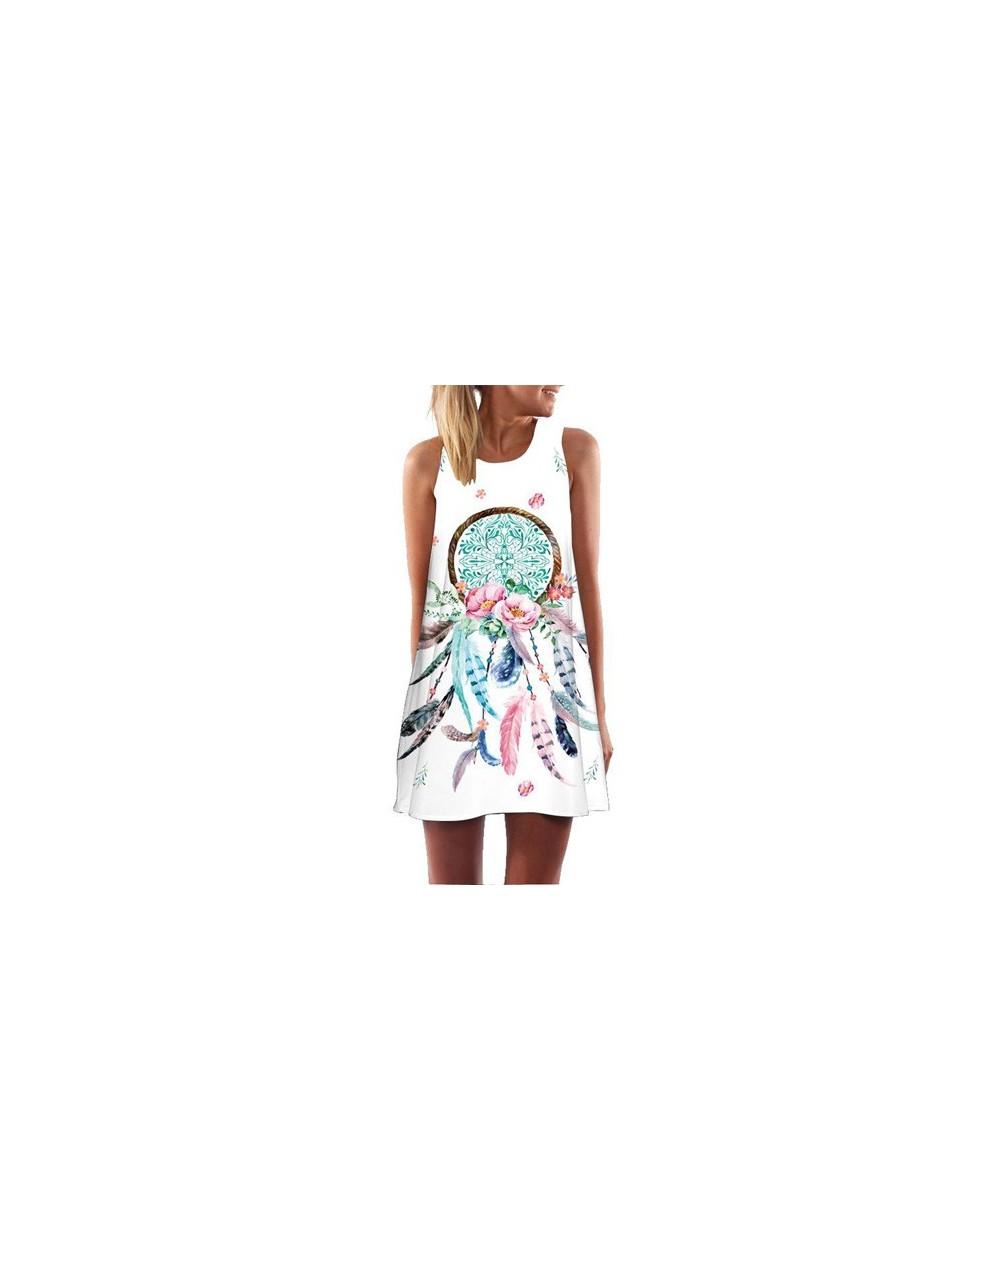 Women Dress 2019 New Arrival Floral Print Short Chiffon Summer Dress Sleeveless Casual Loose Boho Beach Dress sukienki - 352...